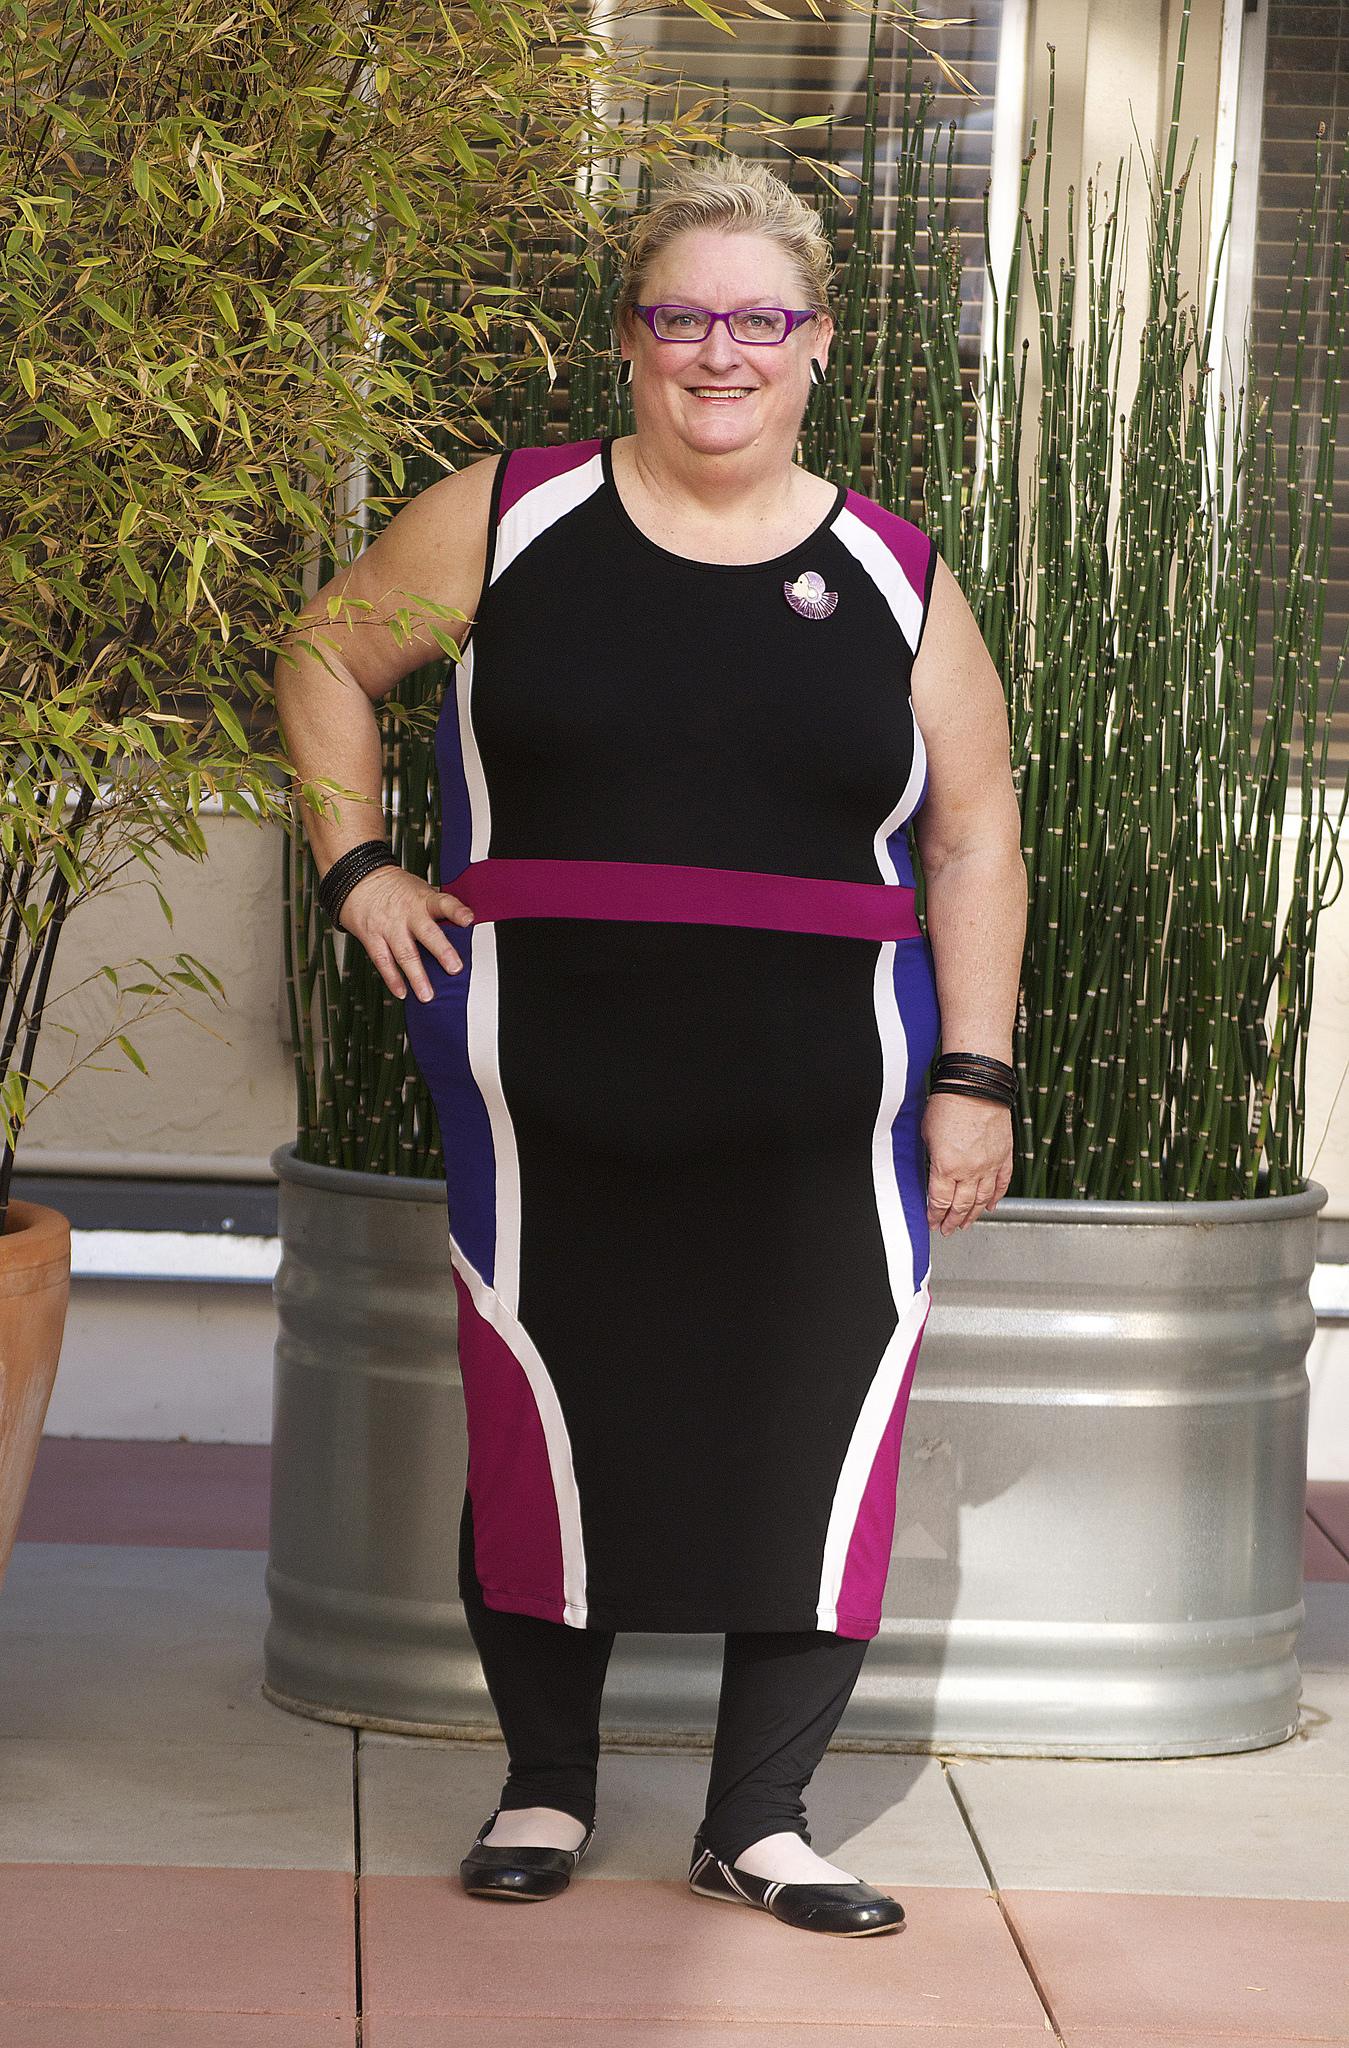 ASOS Curve Body Con Dress Size 24 - Review - Affatshionista